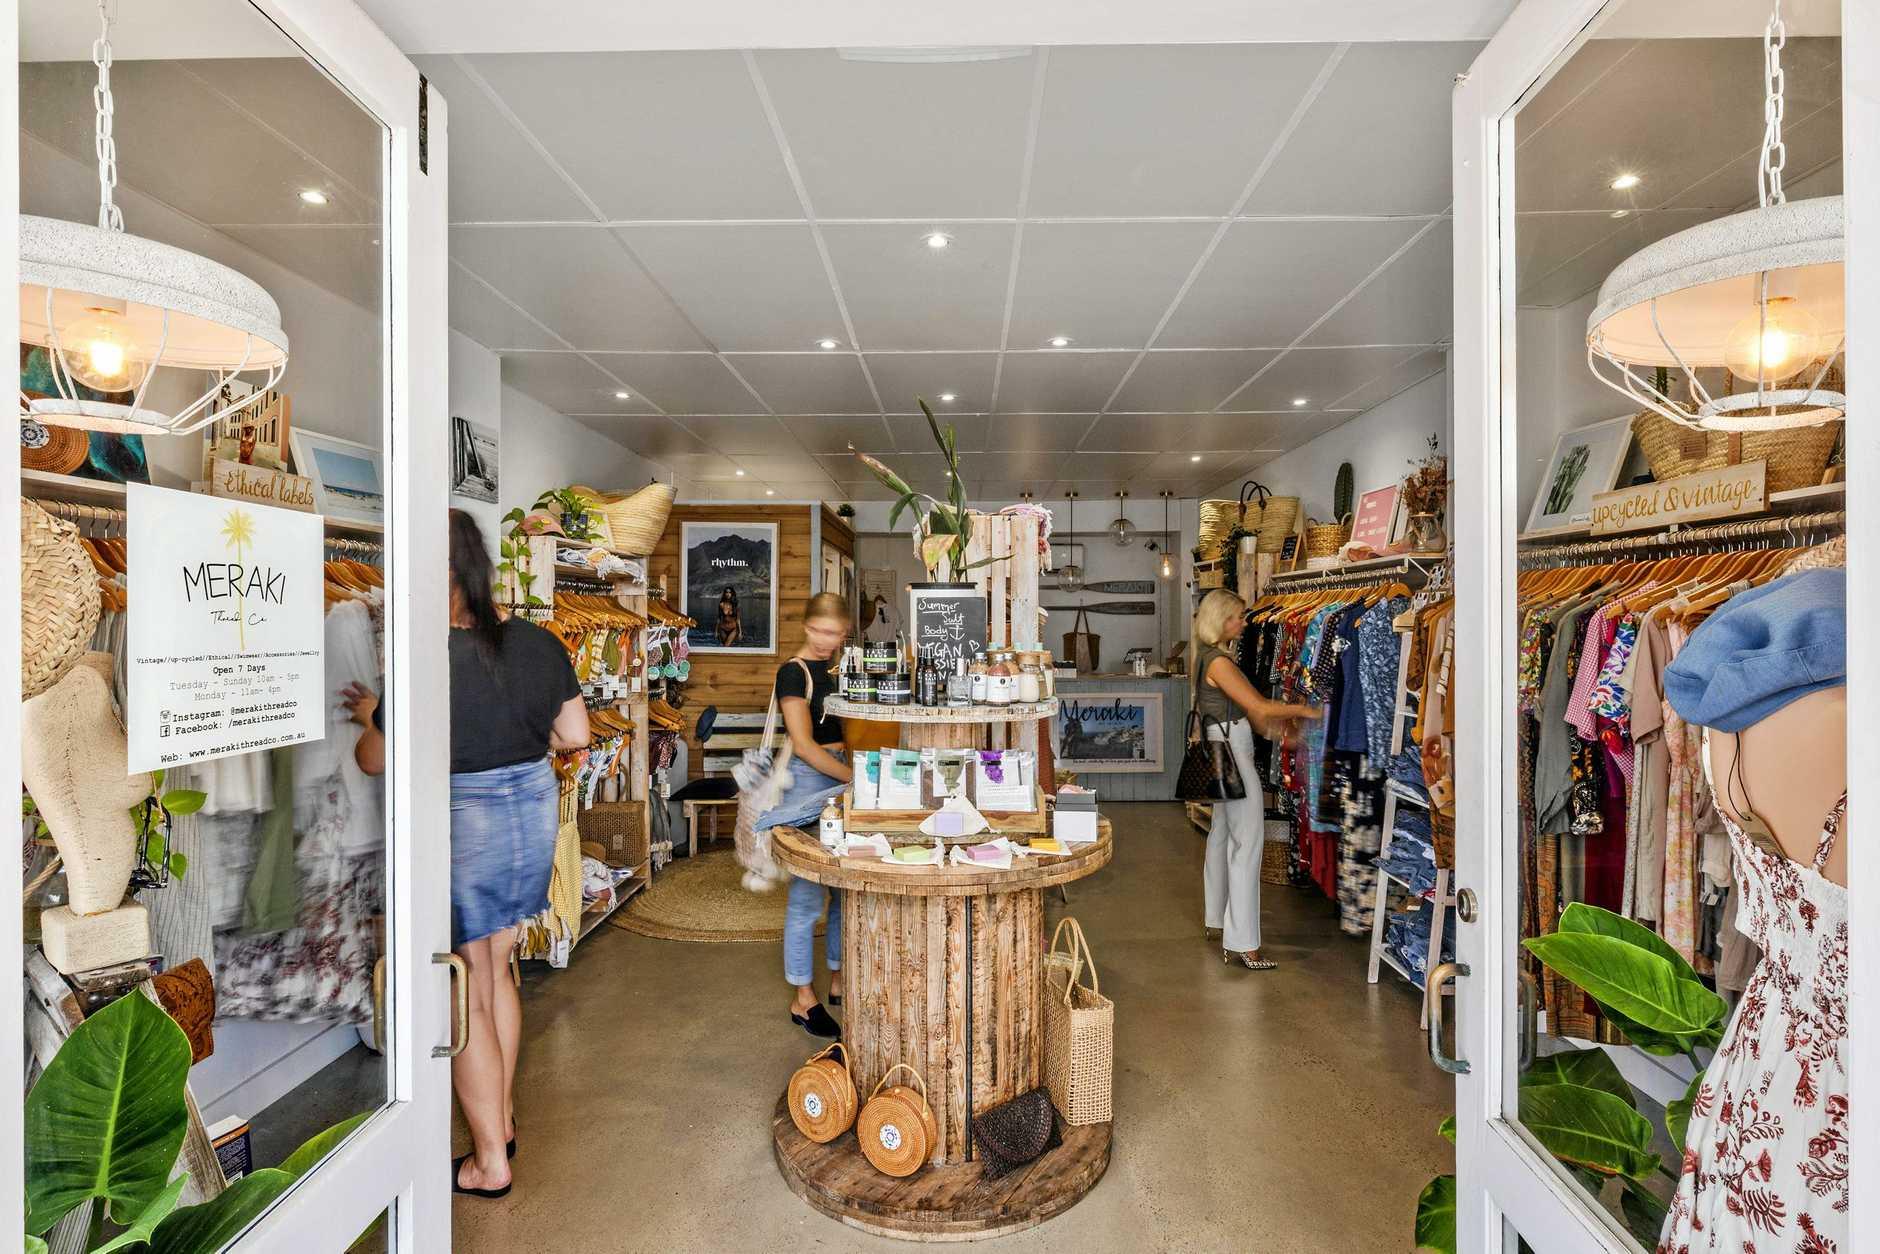 Danni's Top 5 must-visit locations on the Sunshine Coast. Meraki Thread Co.